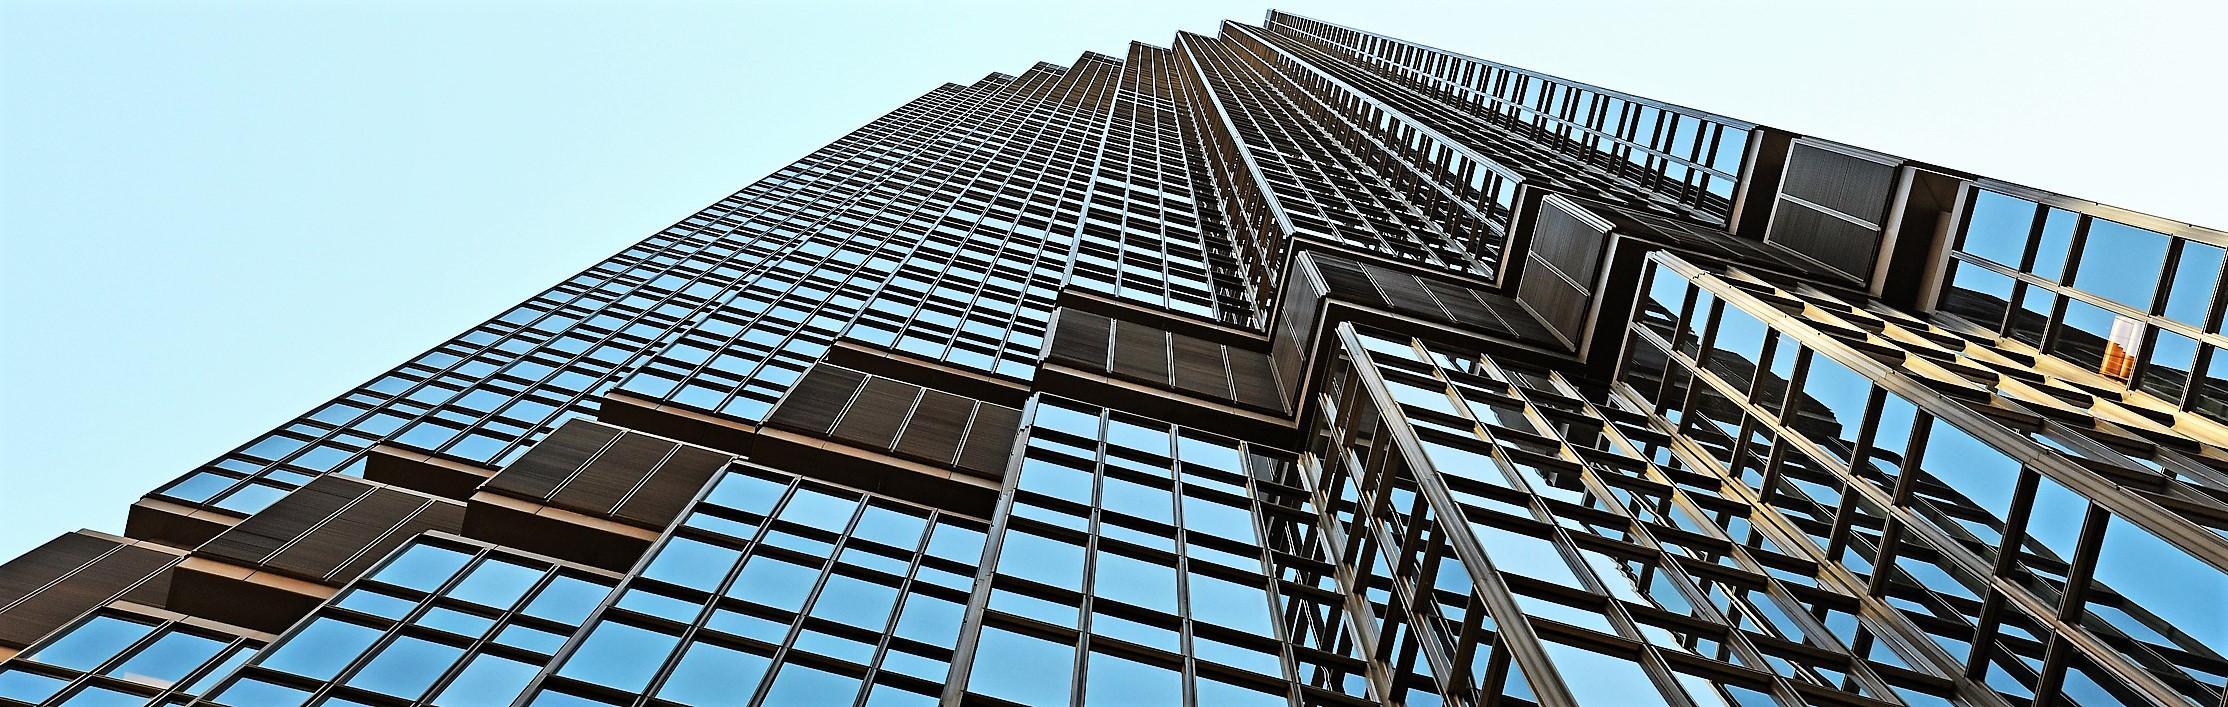 Minneapolis IDS Building